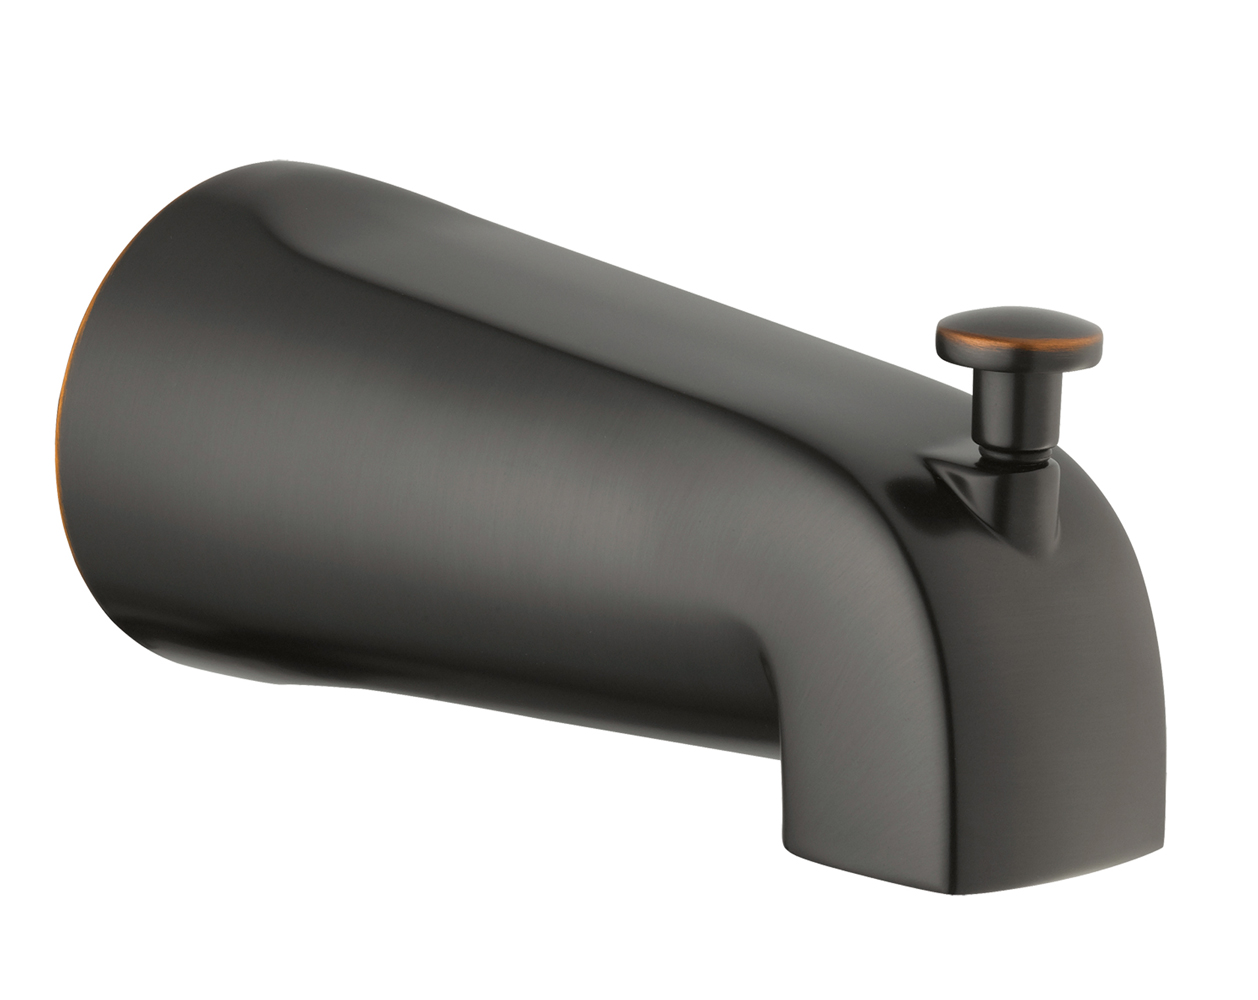 Design House 522920 Slip on Tub Diverter Spout, Oil Rubbed Bronze